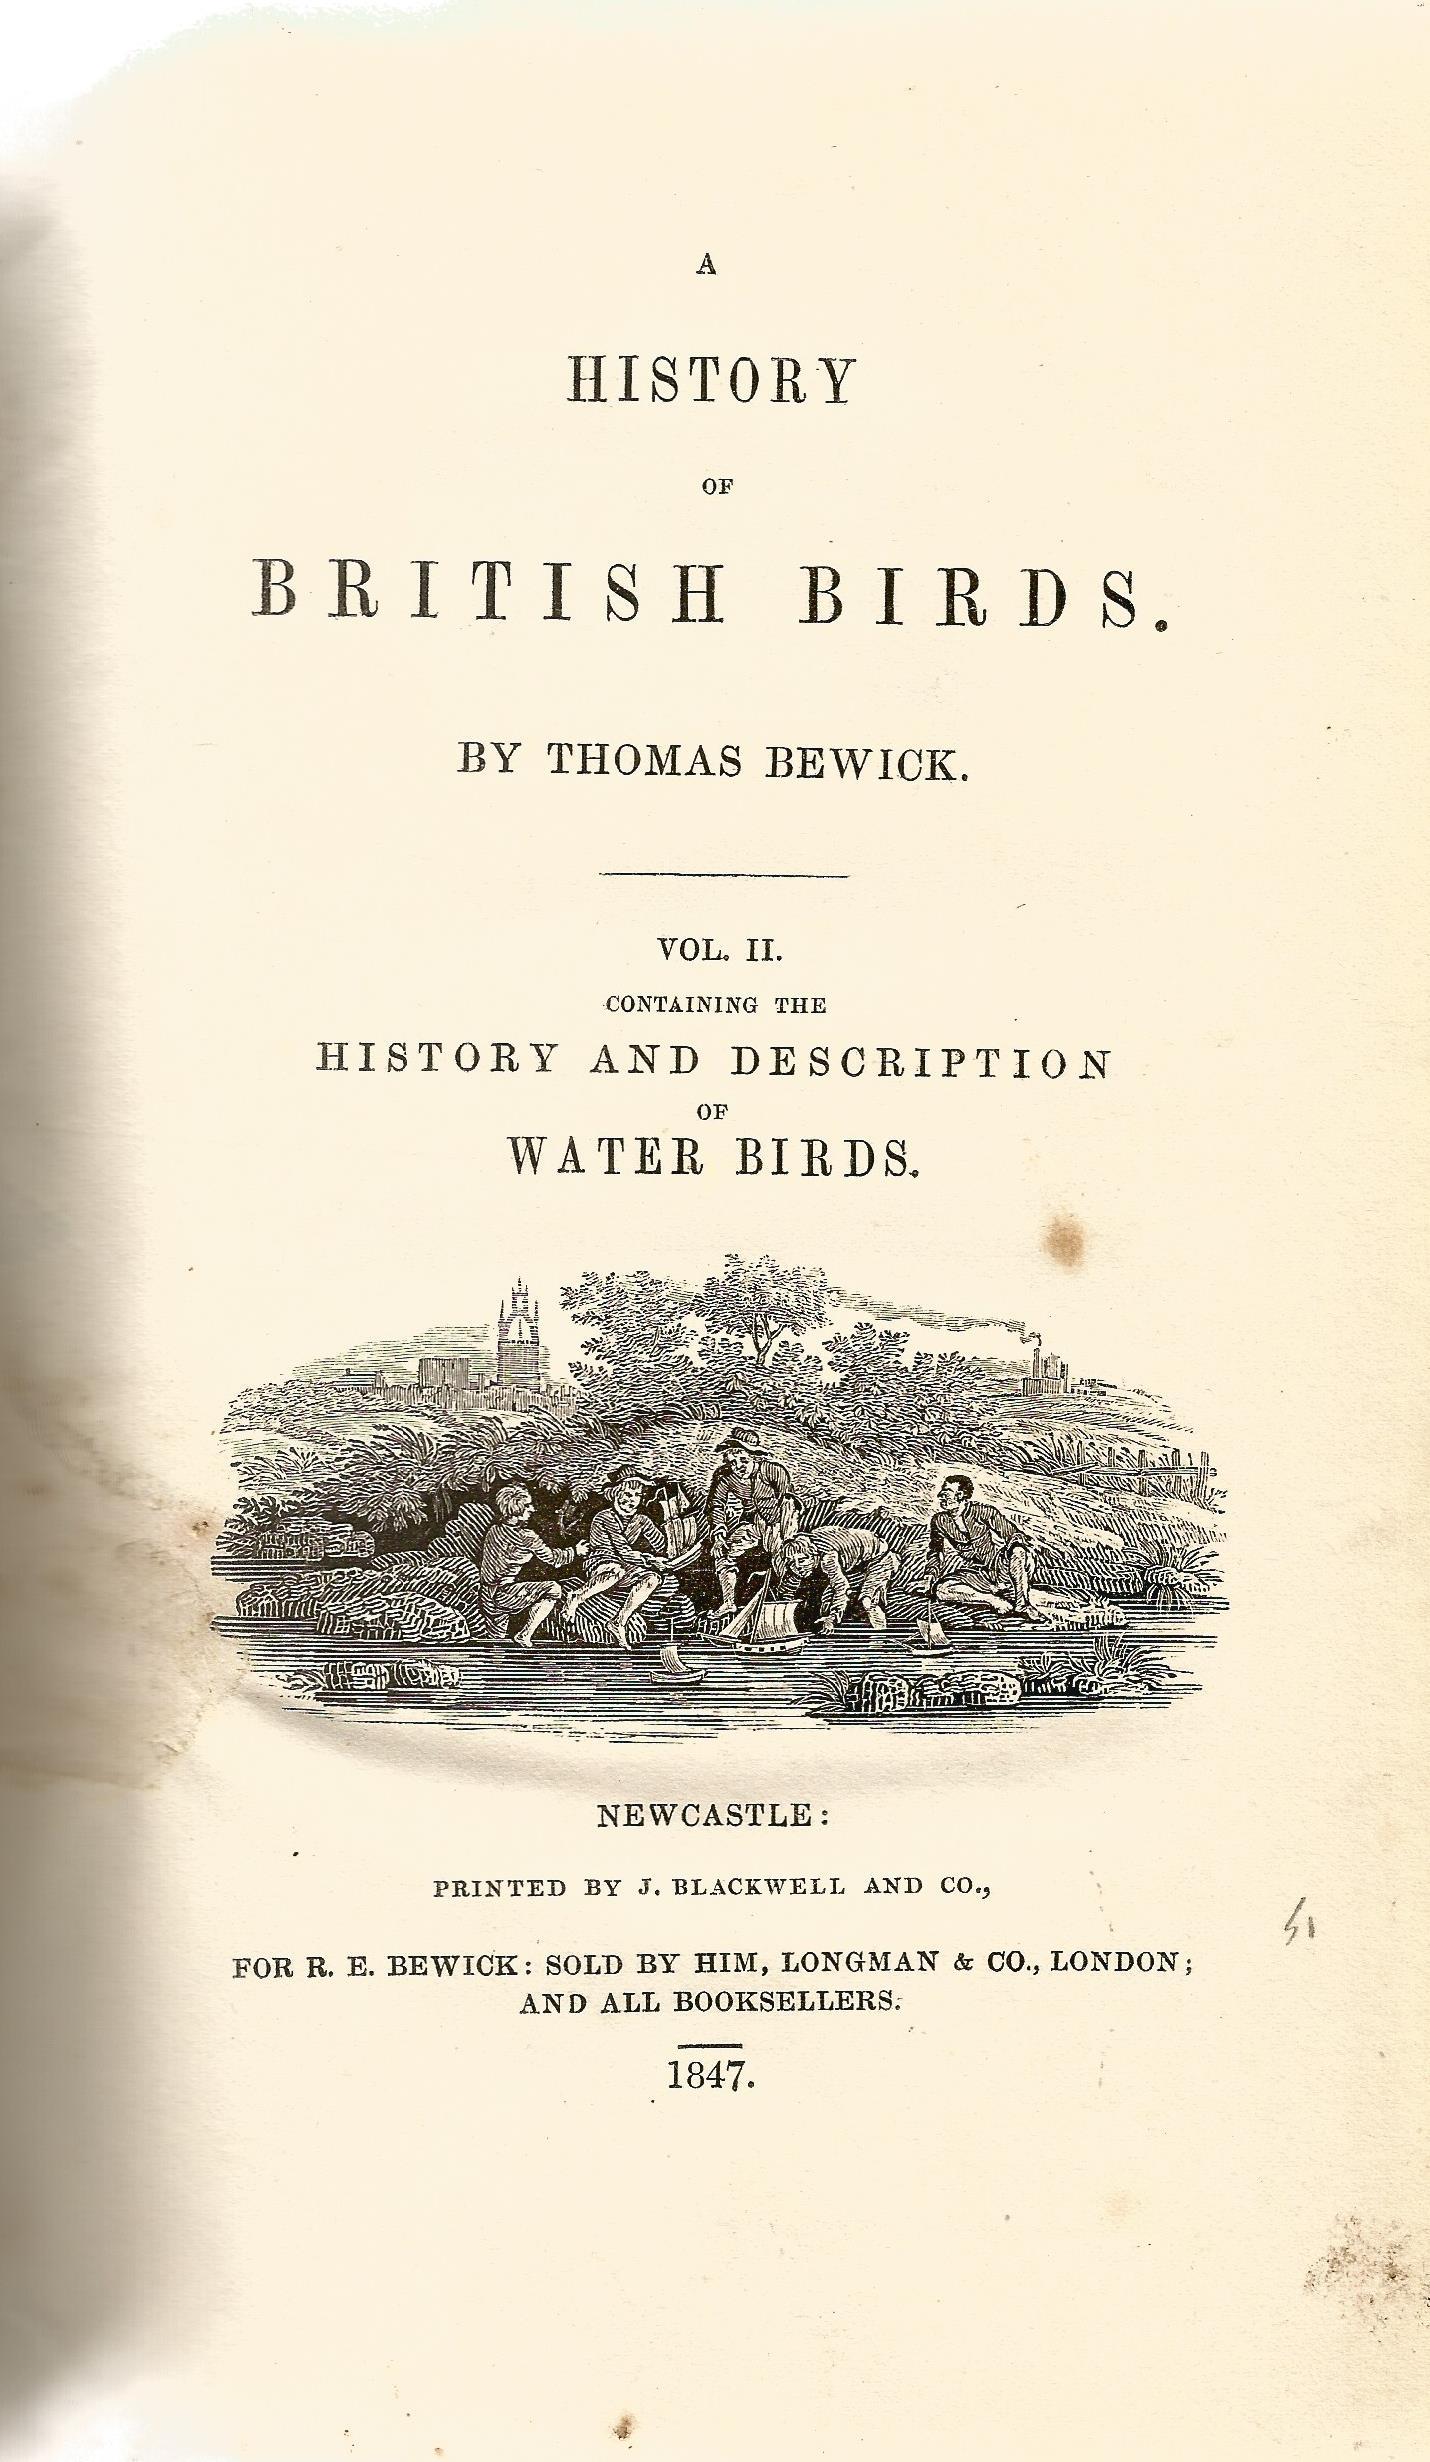 2 Hardback Books Bewick Birds A History of British Birds by Thomas Bewick 1847 Full Leather Bindings - Image 5 of 5